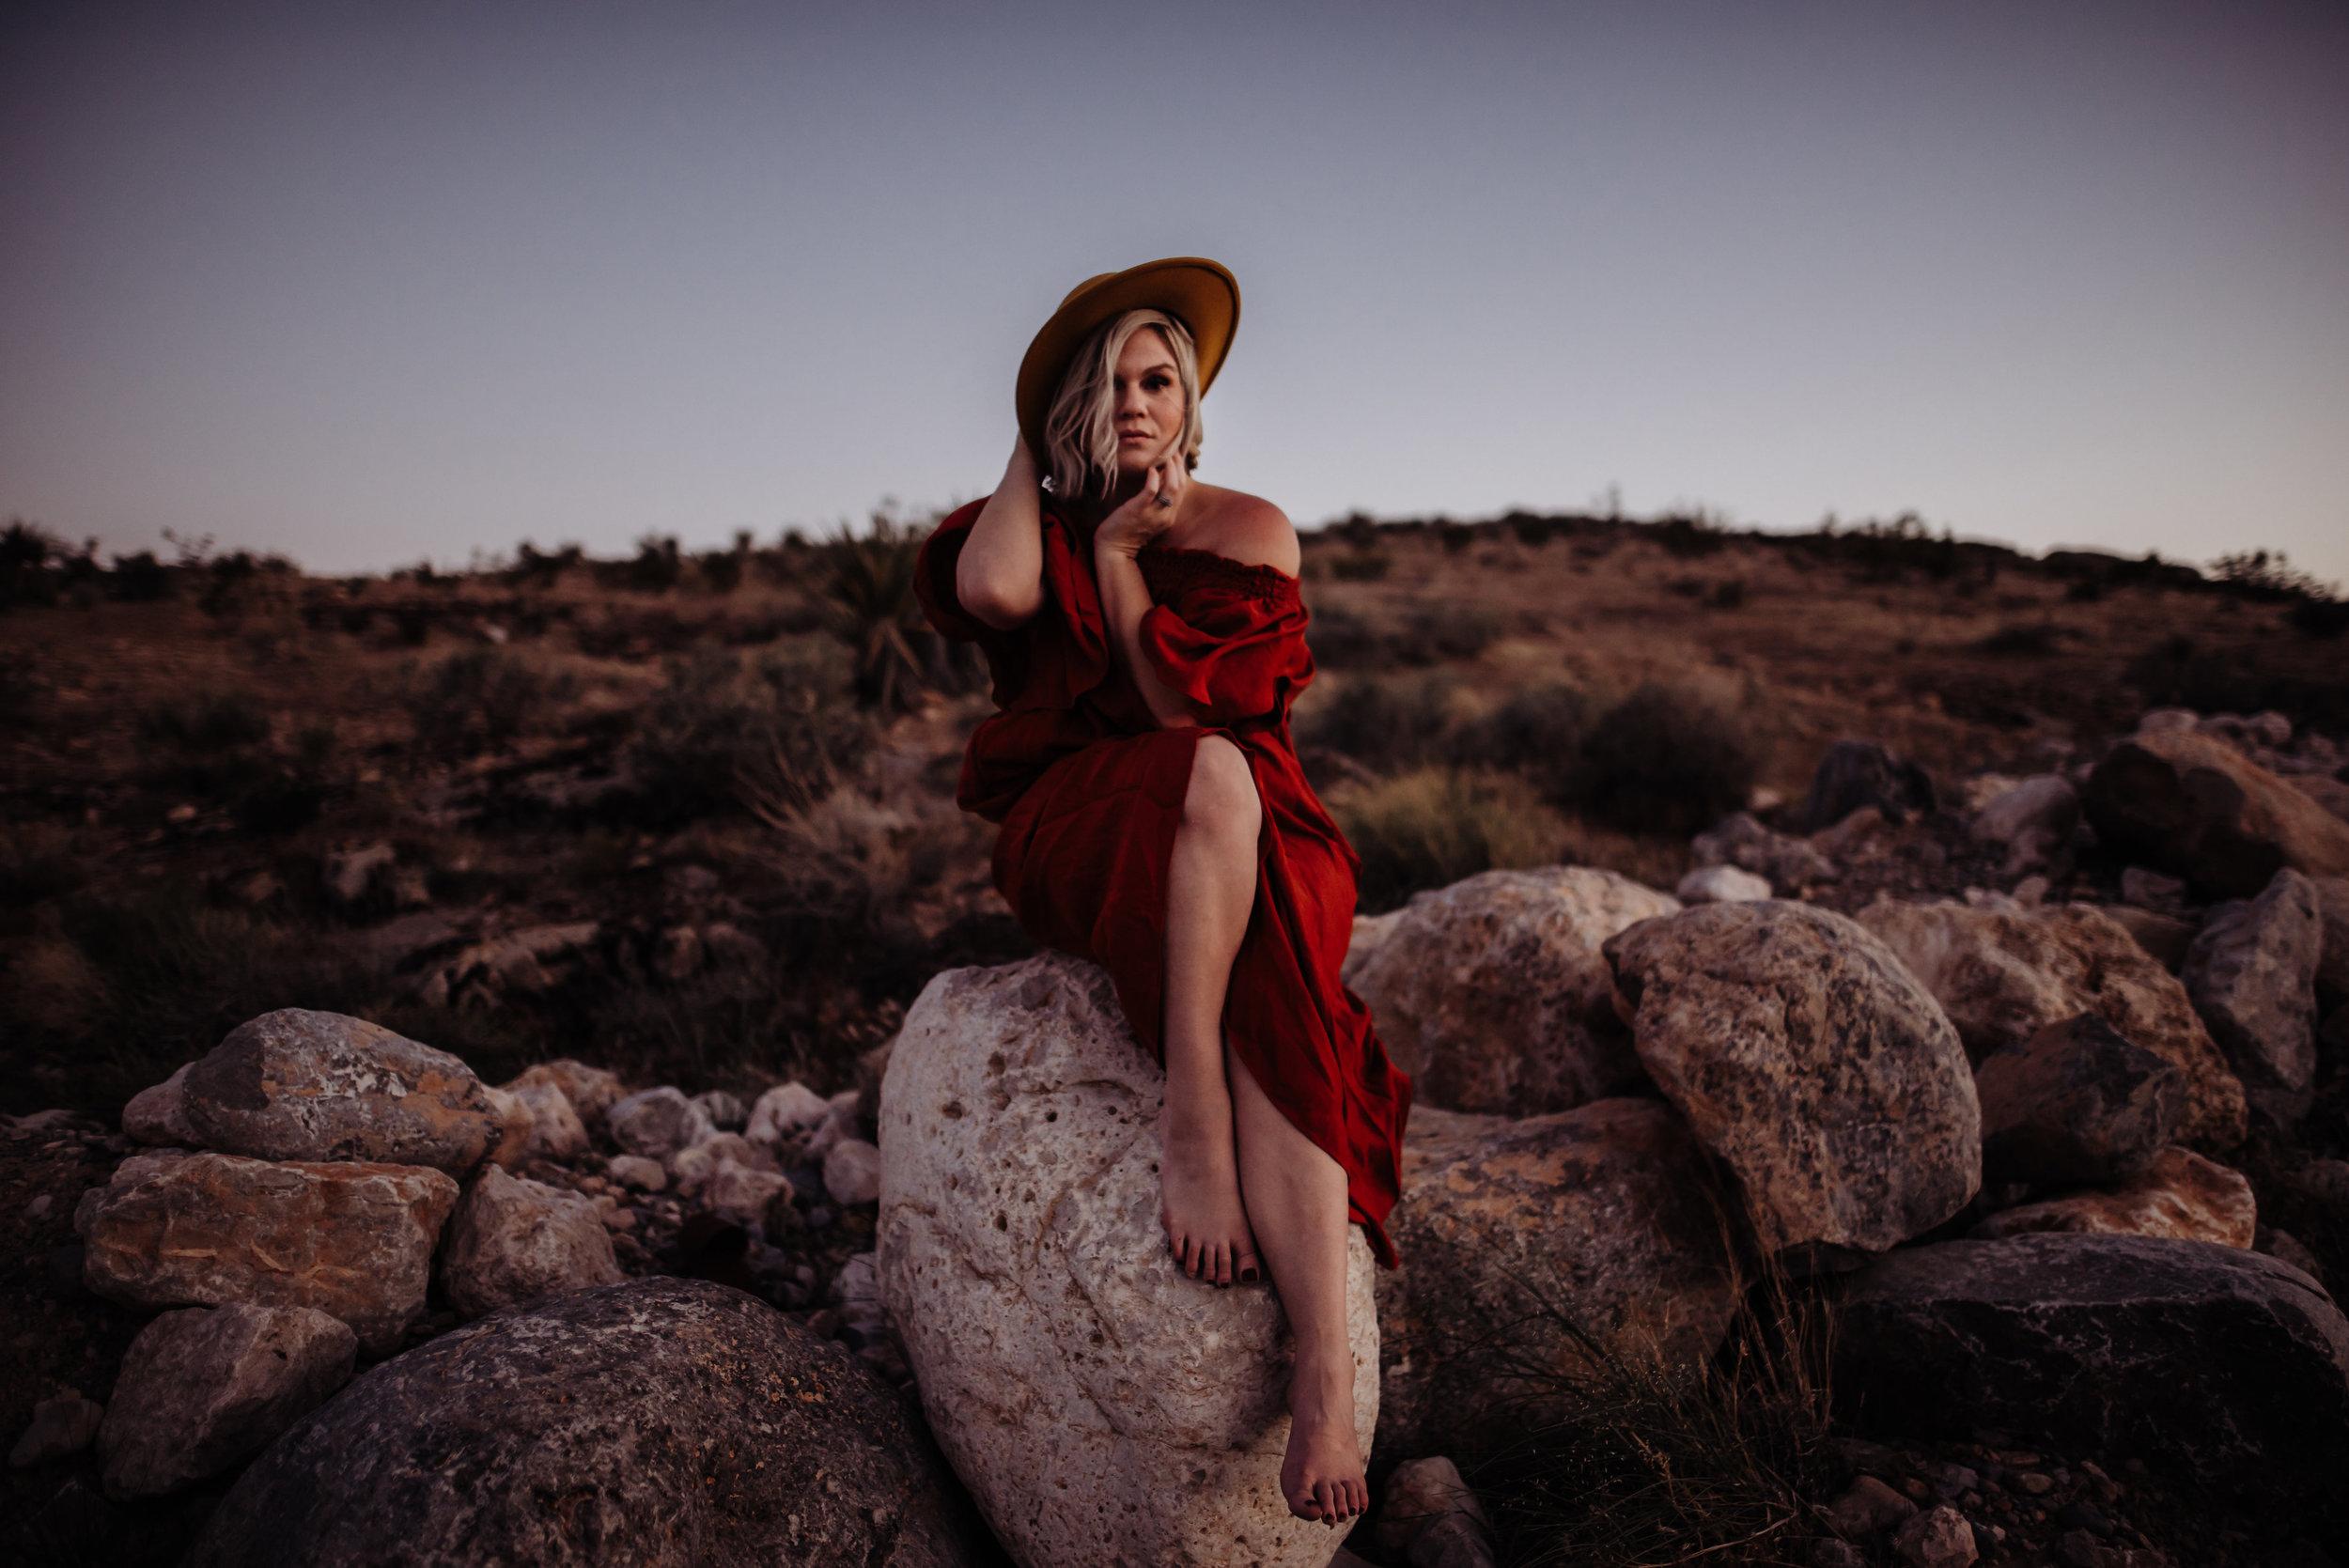 Meet Kristina - ▷ HOUSTON, TX   Available for travel worldwide▷ Adventurous, intimate, raw love photography